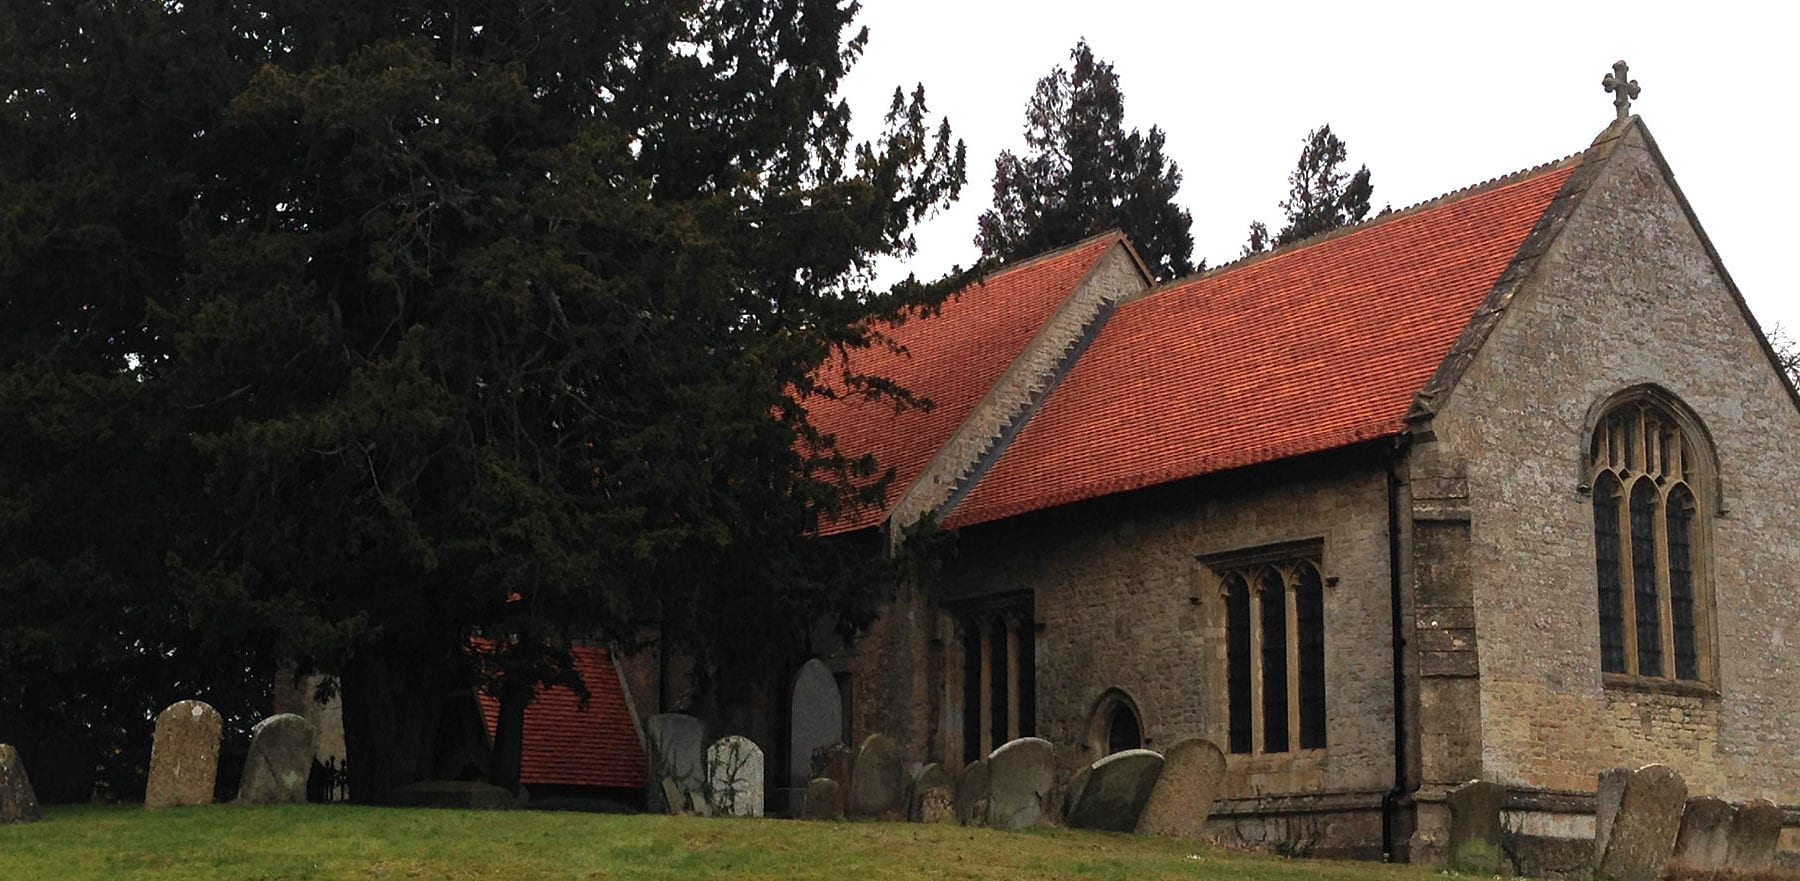 Lifestiles - Handcrafted Orange Clay Roof Tiles - Letcombe, England 5